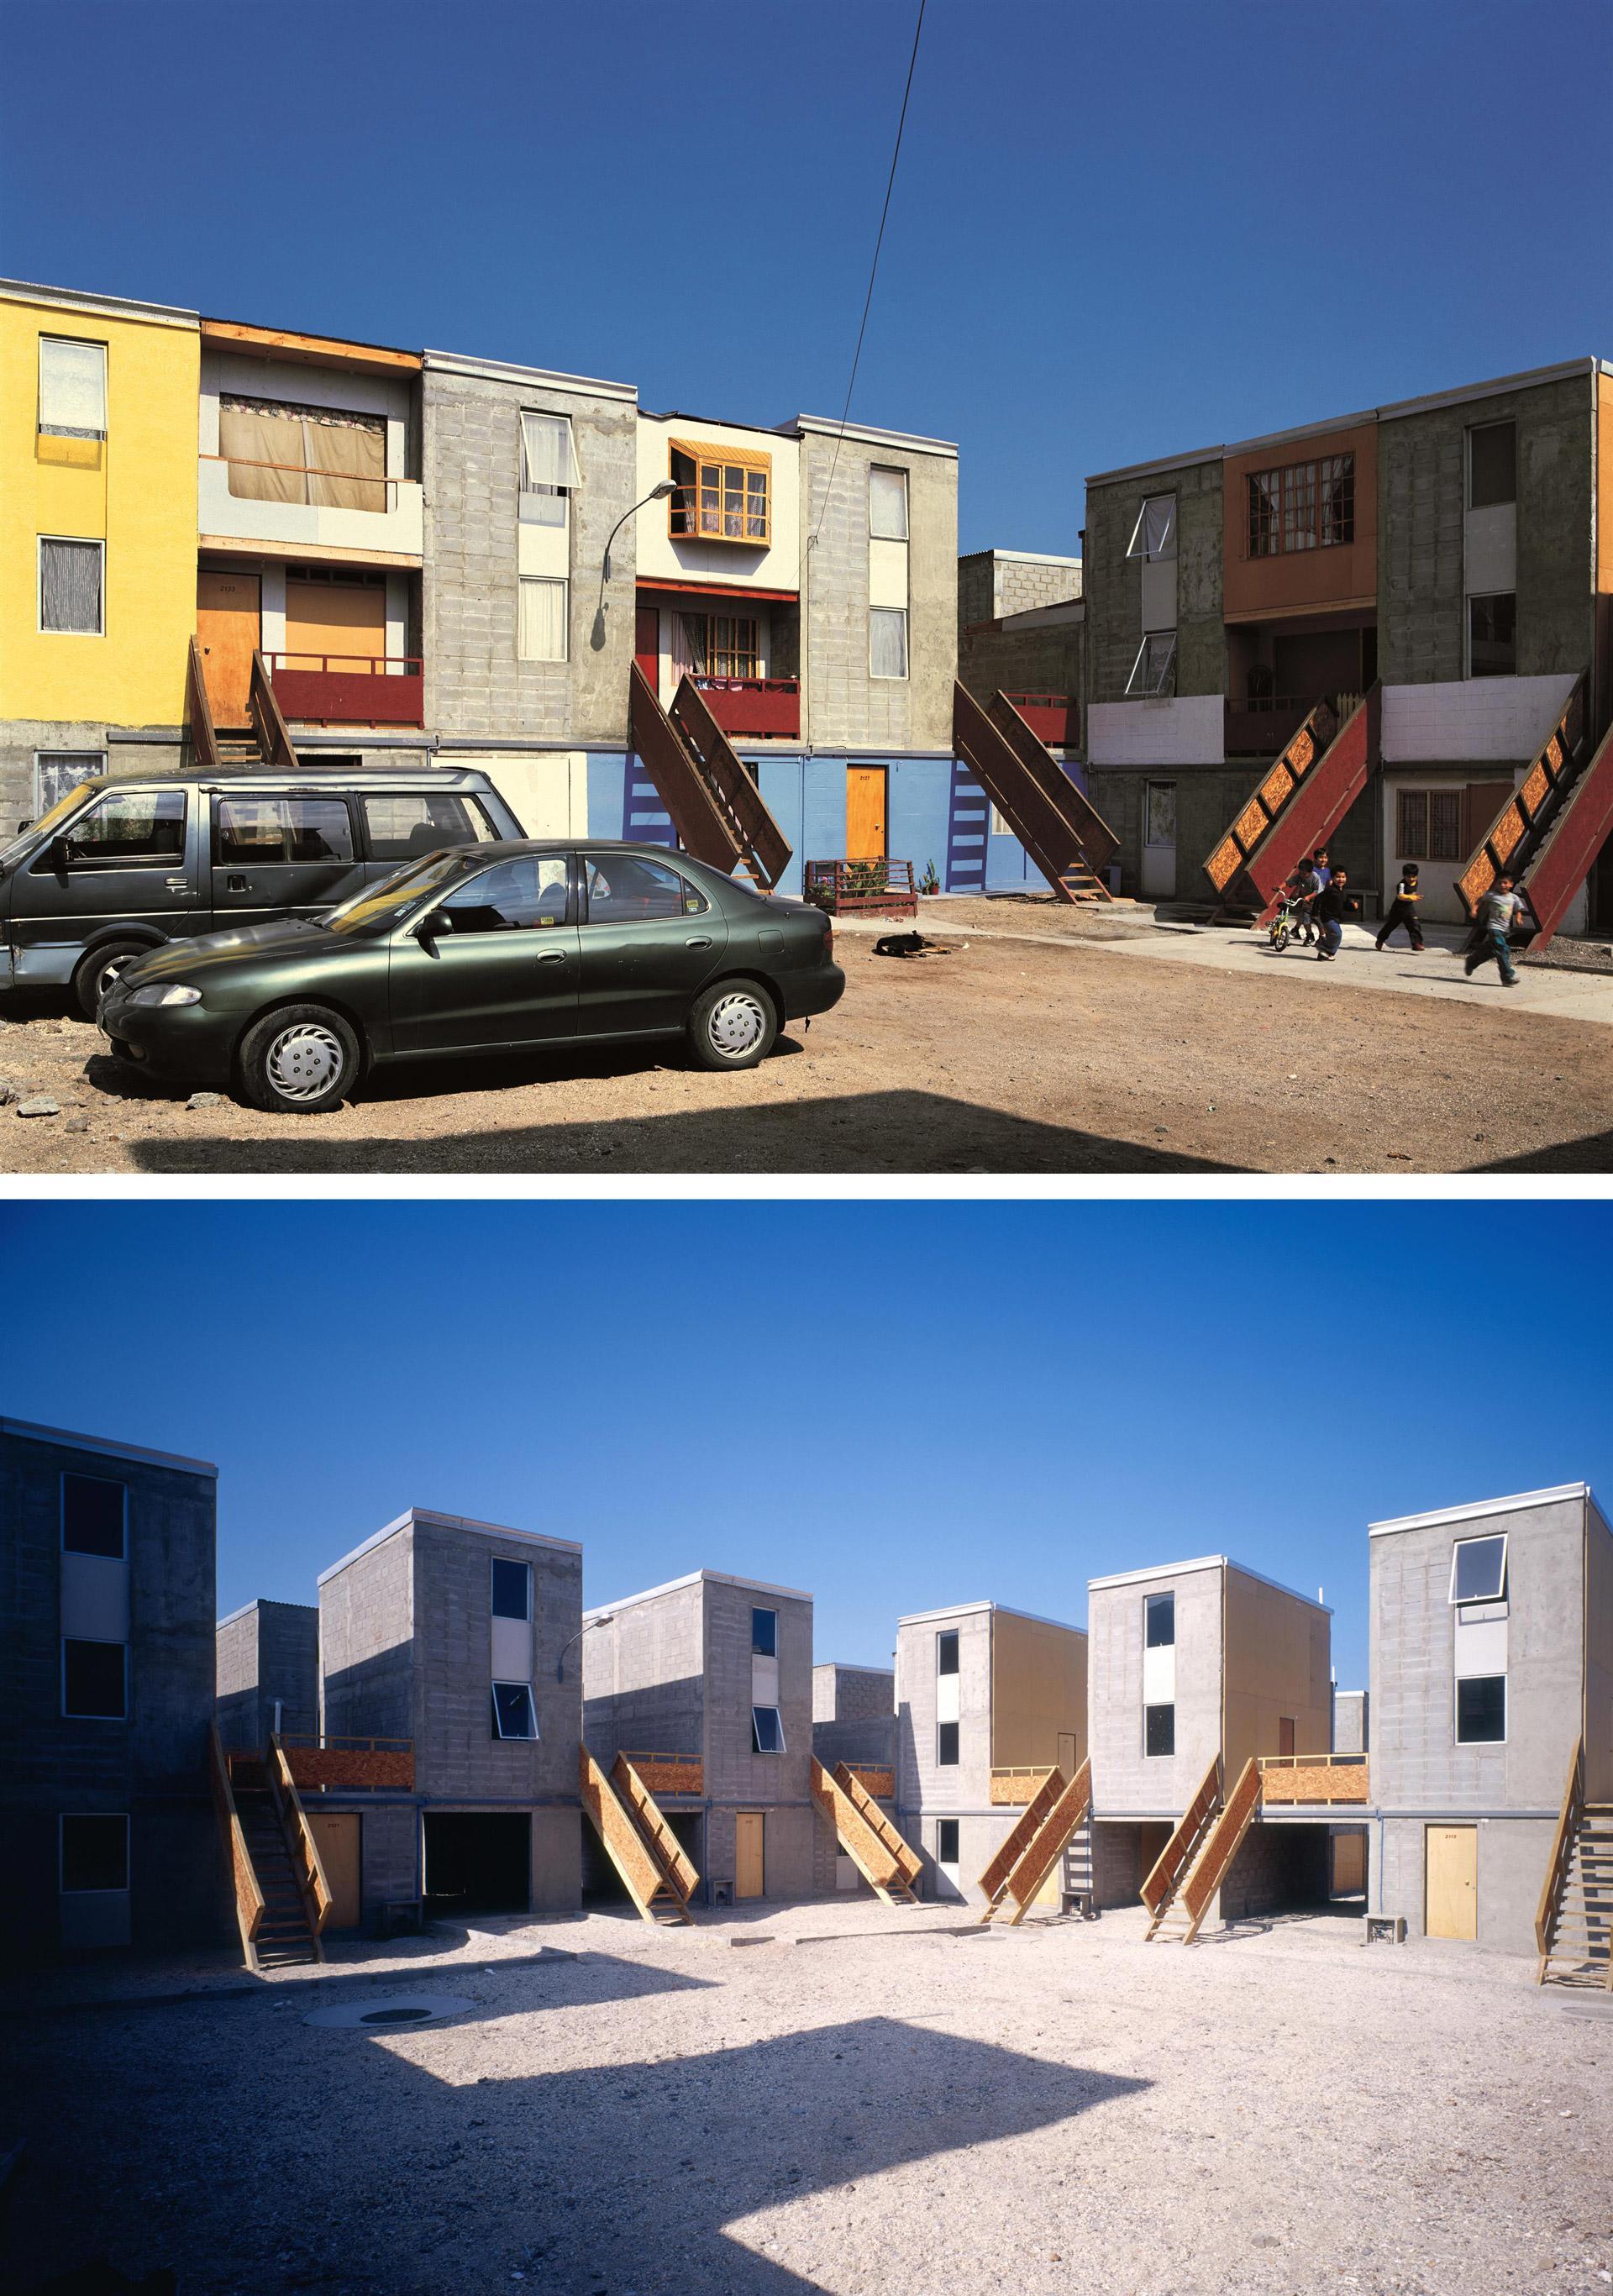 Alejandro-Aravena-Quinta-Monroy-Housing-combined